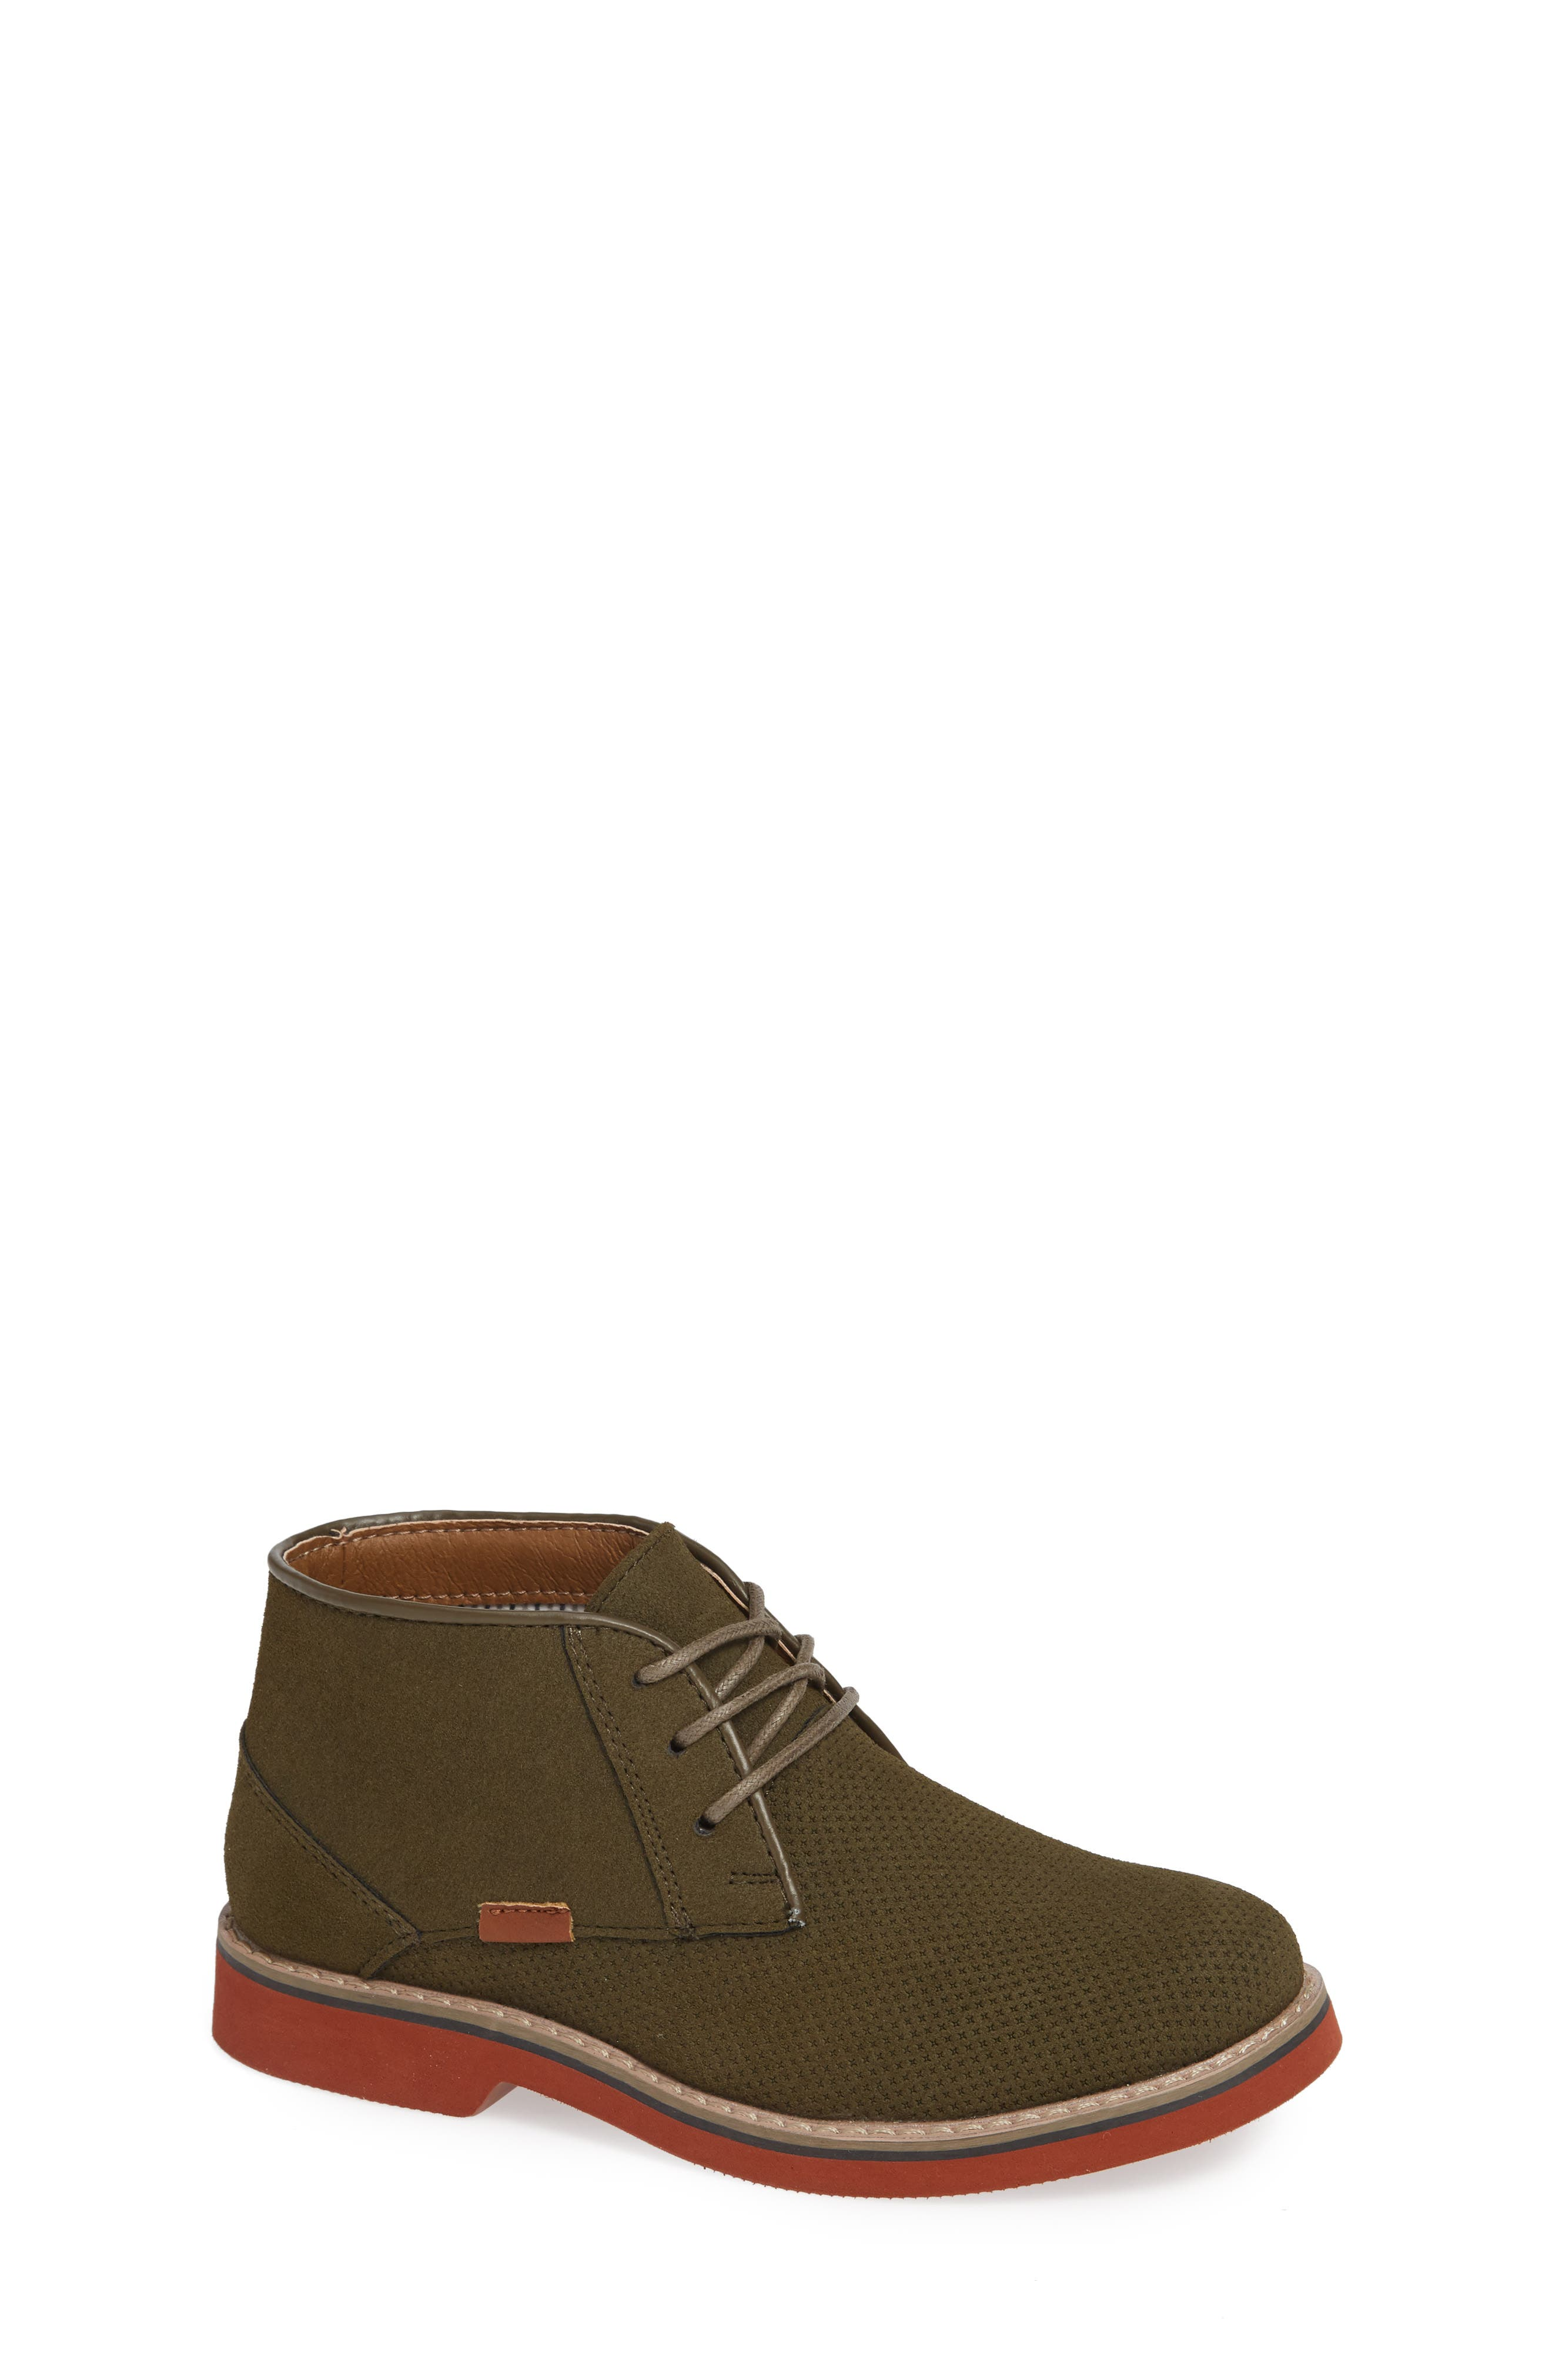 STEVE MADDEN Jake Textured Chukka Boot, Main, color, OLIVE